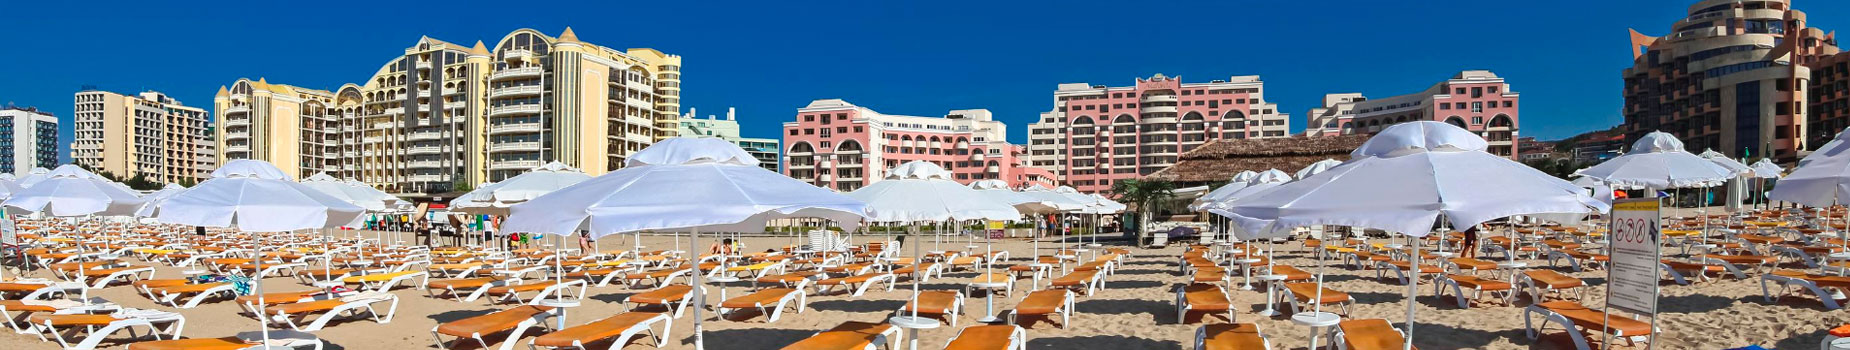 Kindvriendelijke hotels Sunny Beach